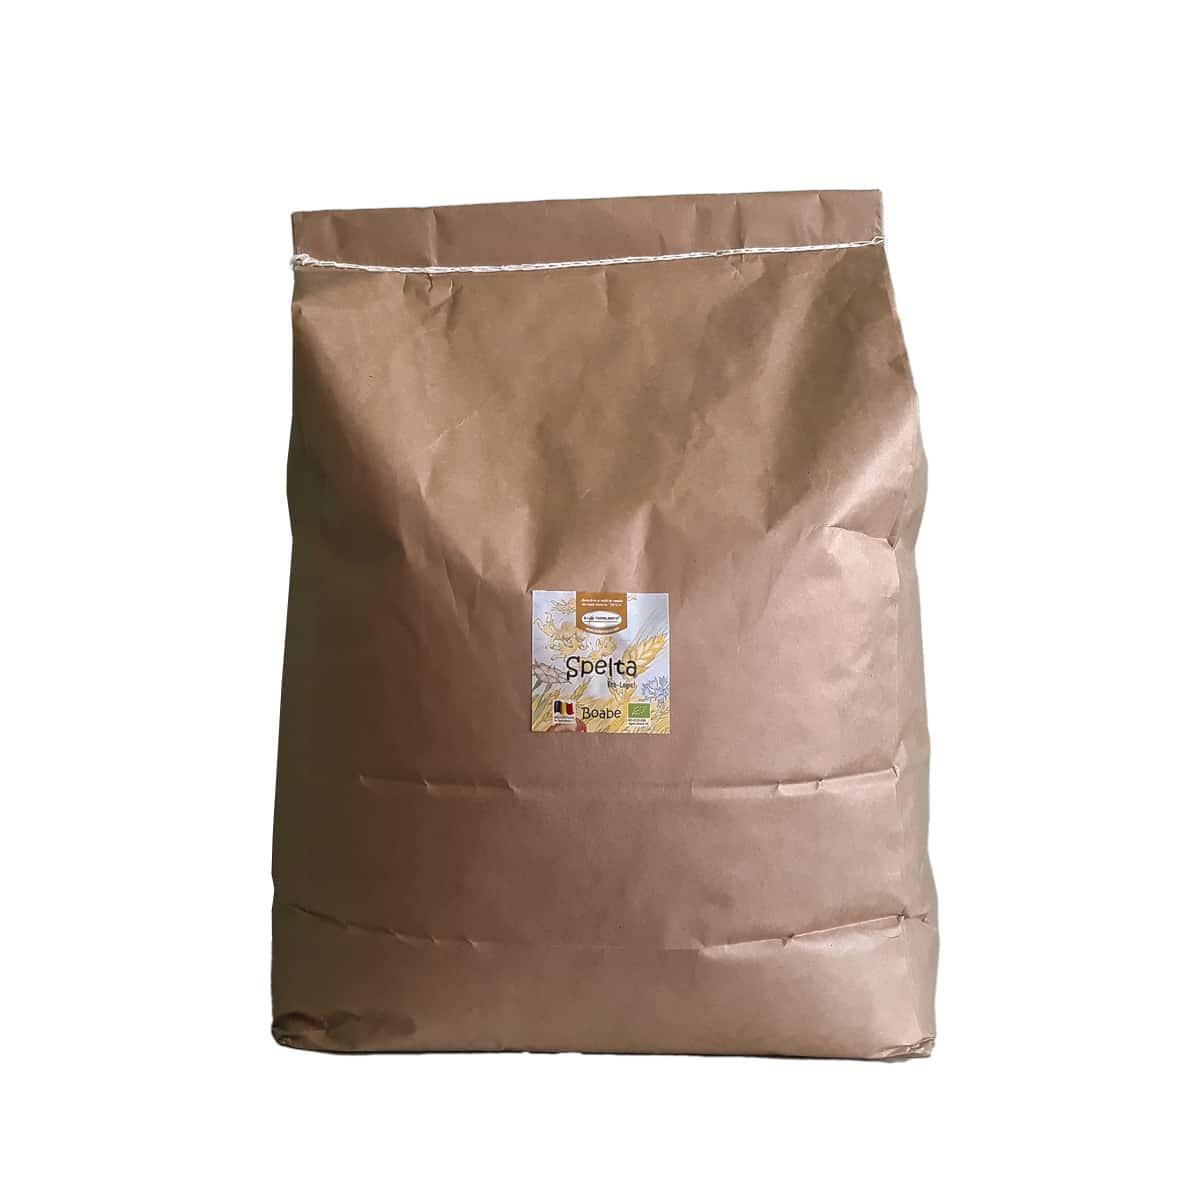 Boabe Spelta ecologice - 20 kg